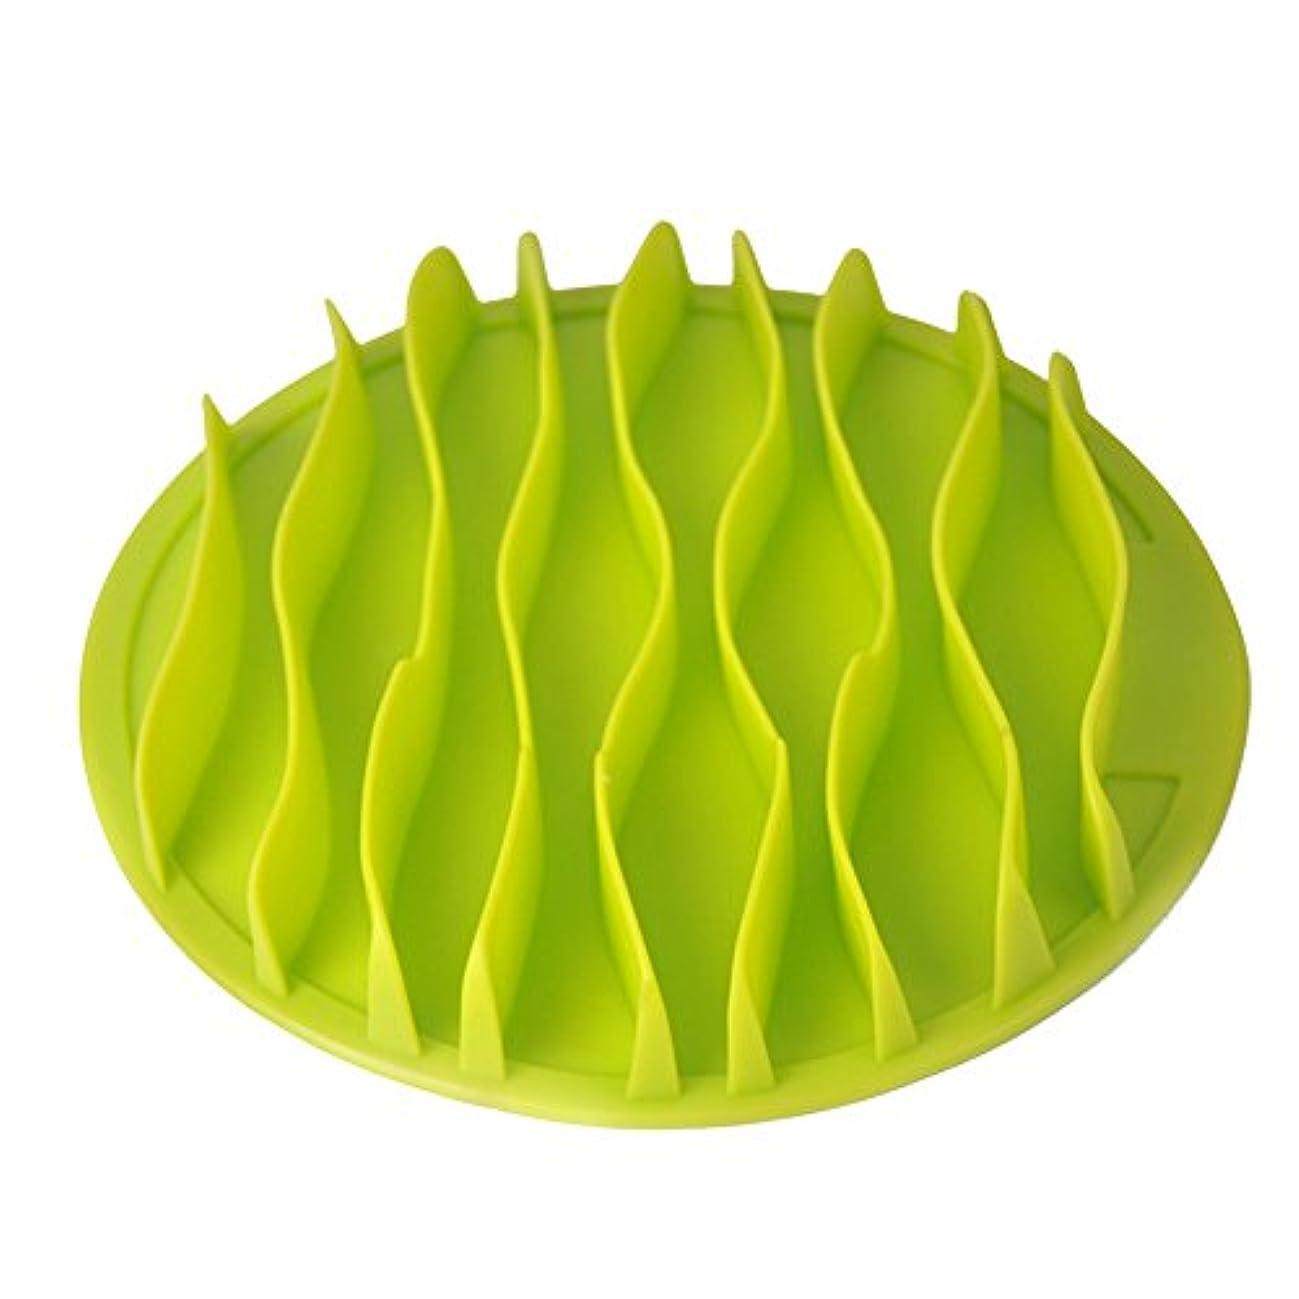 MyMei ペット食器 早食い防止 食べ過ぎ 犬猫用ボウル ペット食事用 給餌器 ペット皿 フードボウル 早食い防止食器 犬用スローフード ゆっくり食べる むせ防止 ペット用品 波 (S, グリーン)